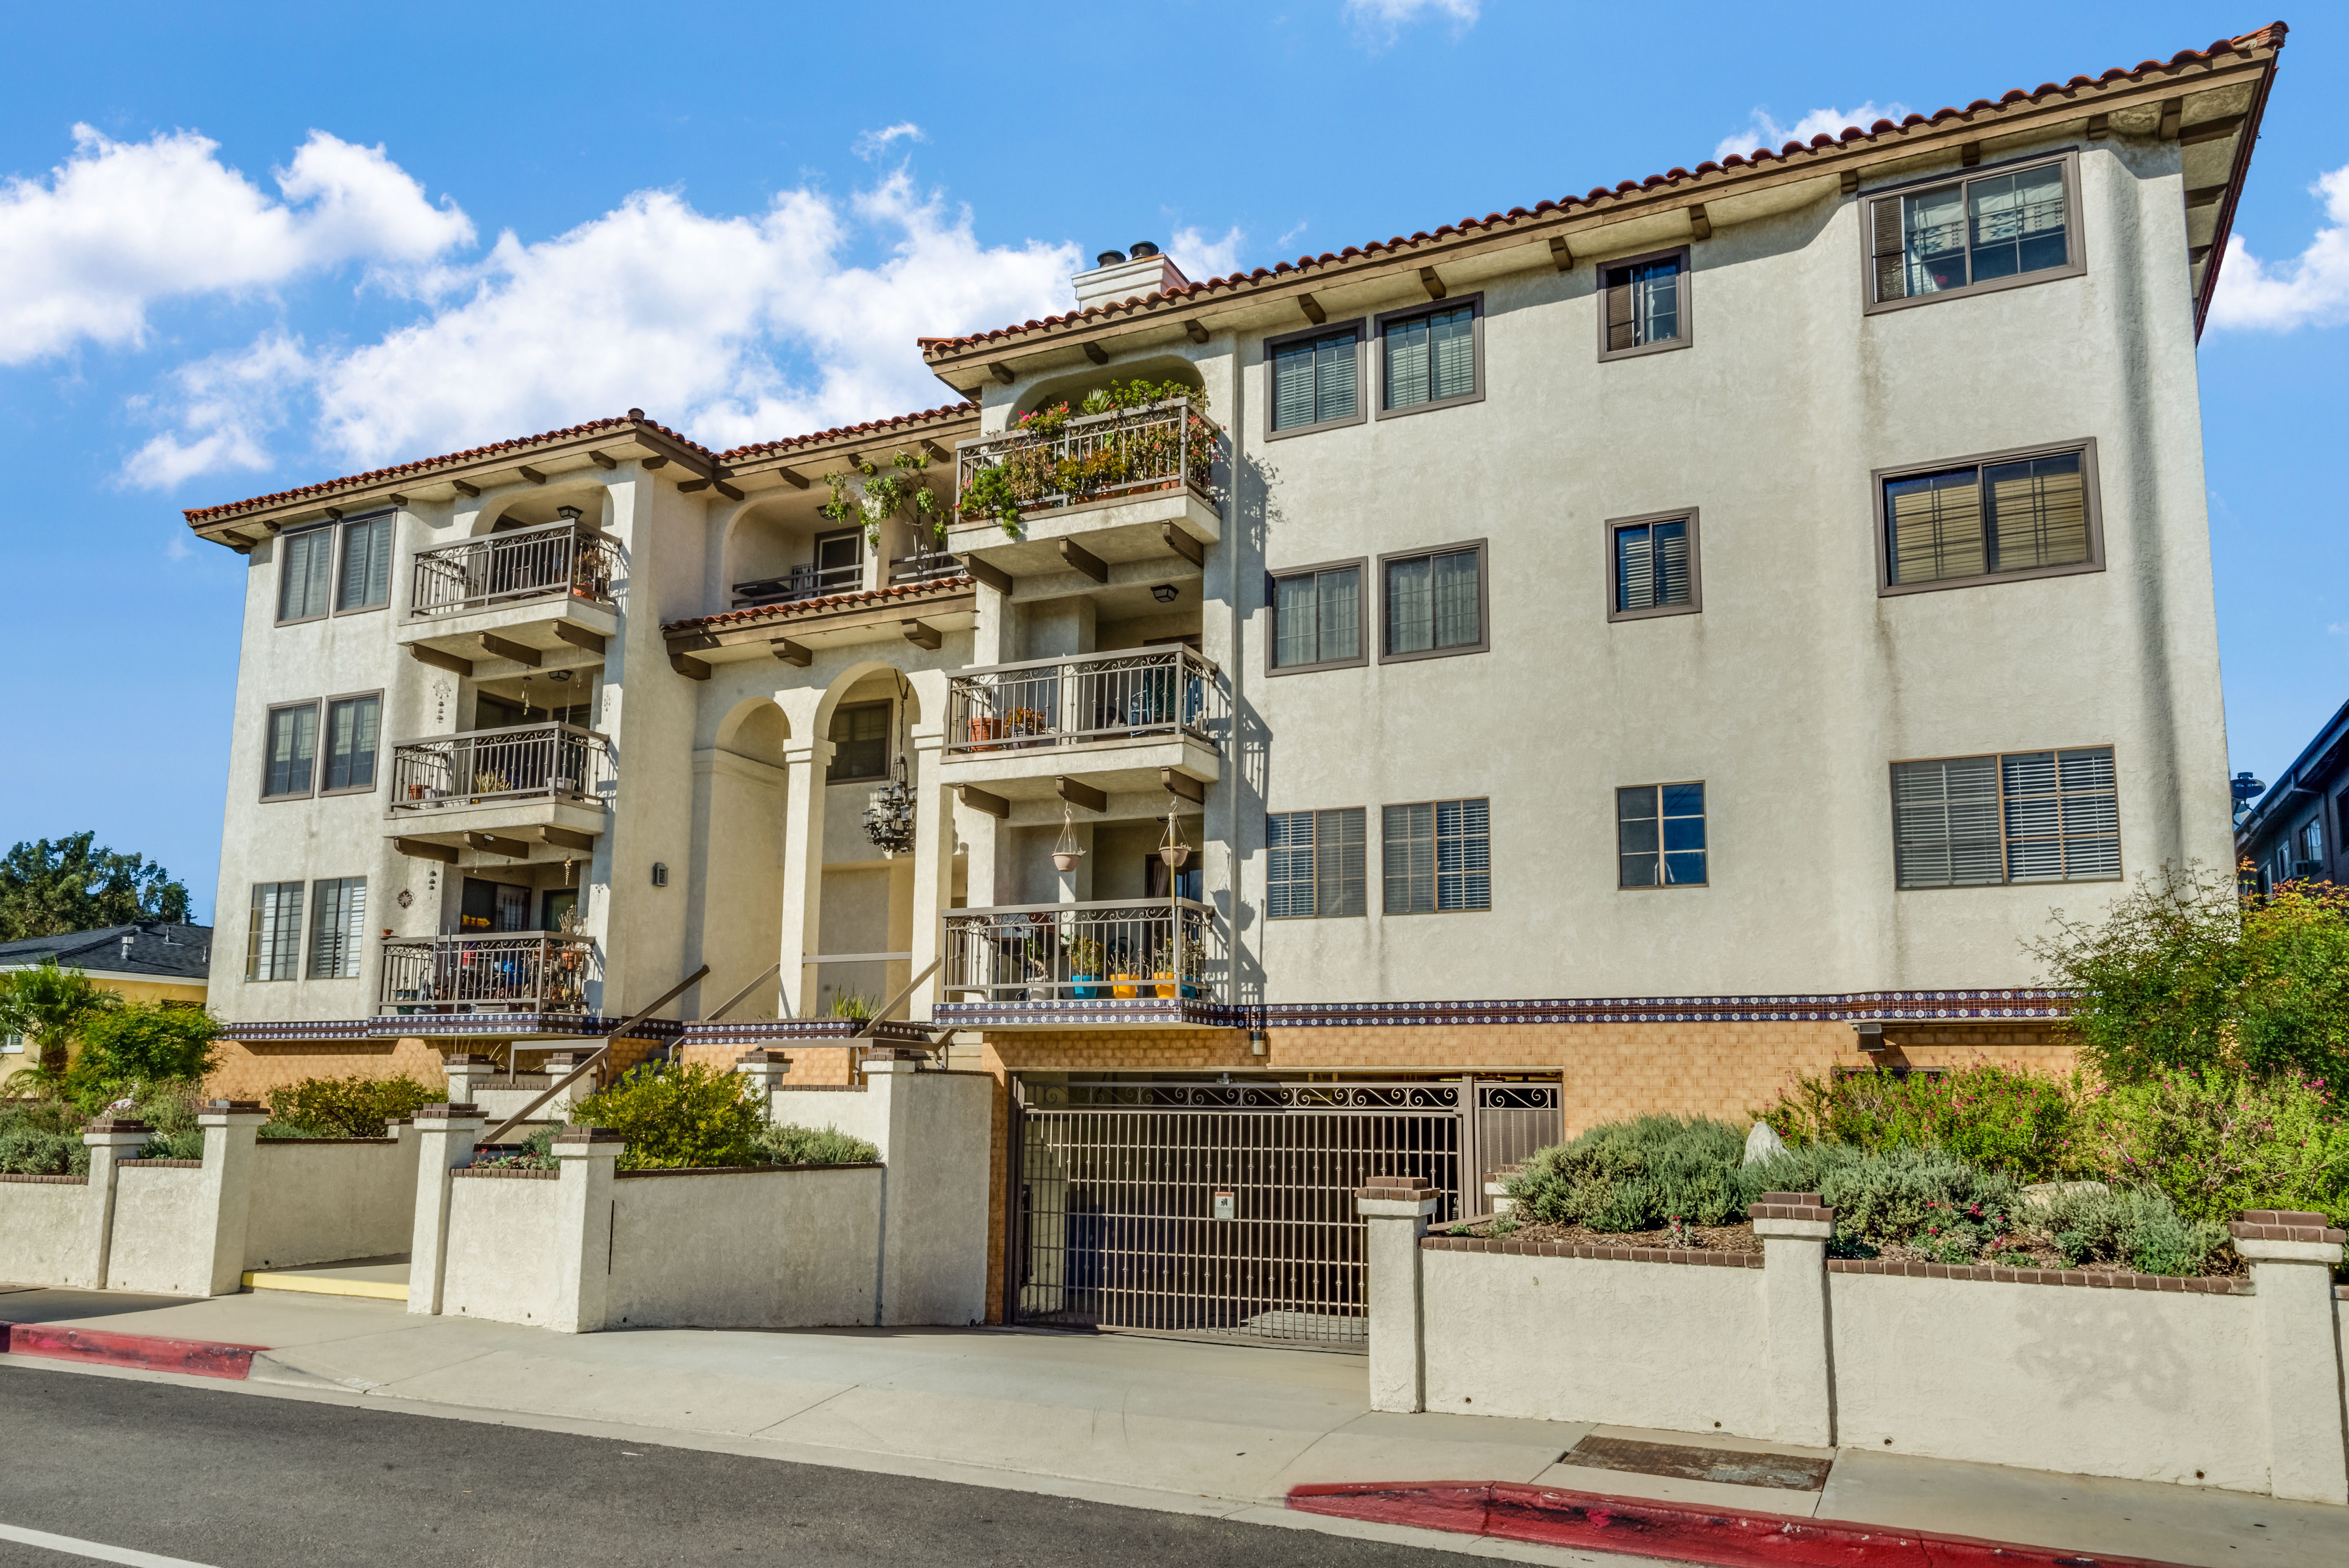 Condominium for Sale at 1150 W 13th ST 1150 W 13th St #102 San Pedro, California 90731 United States